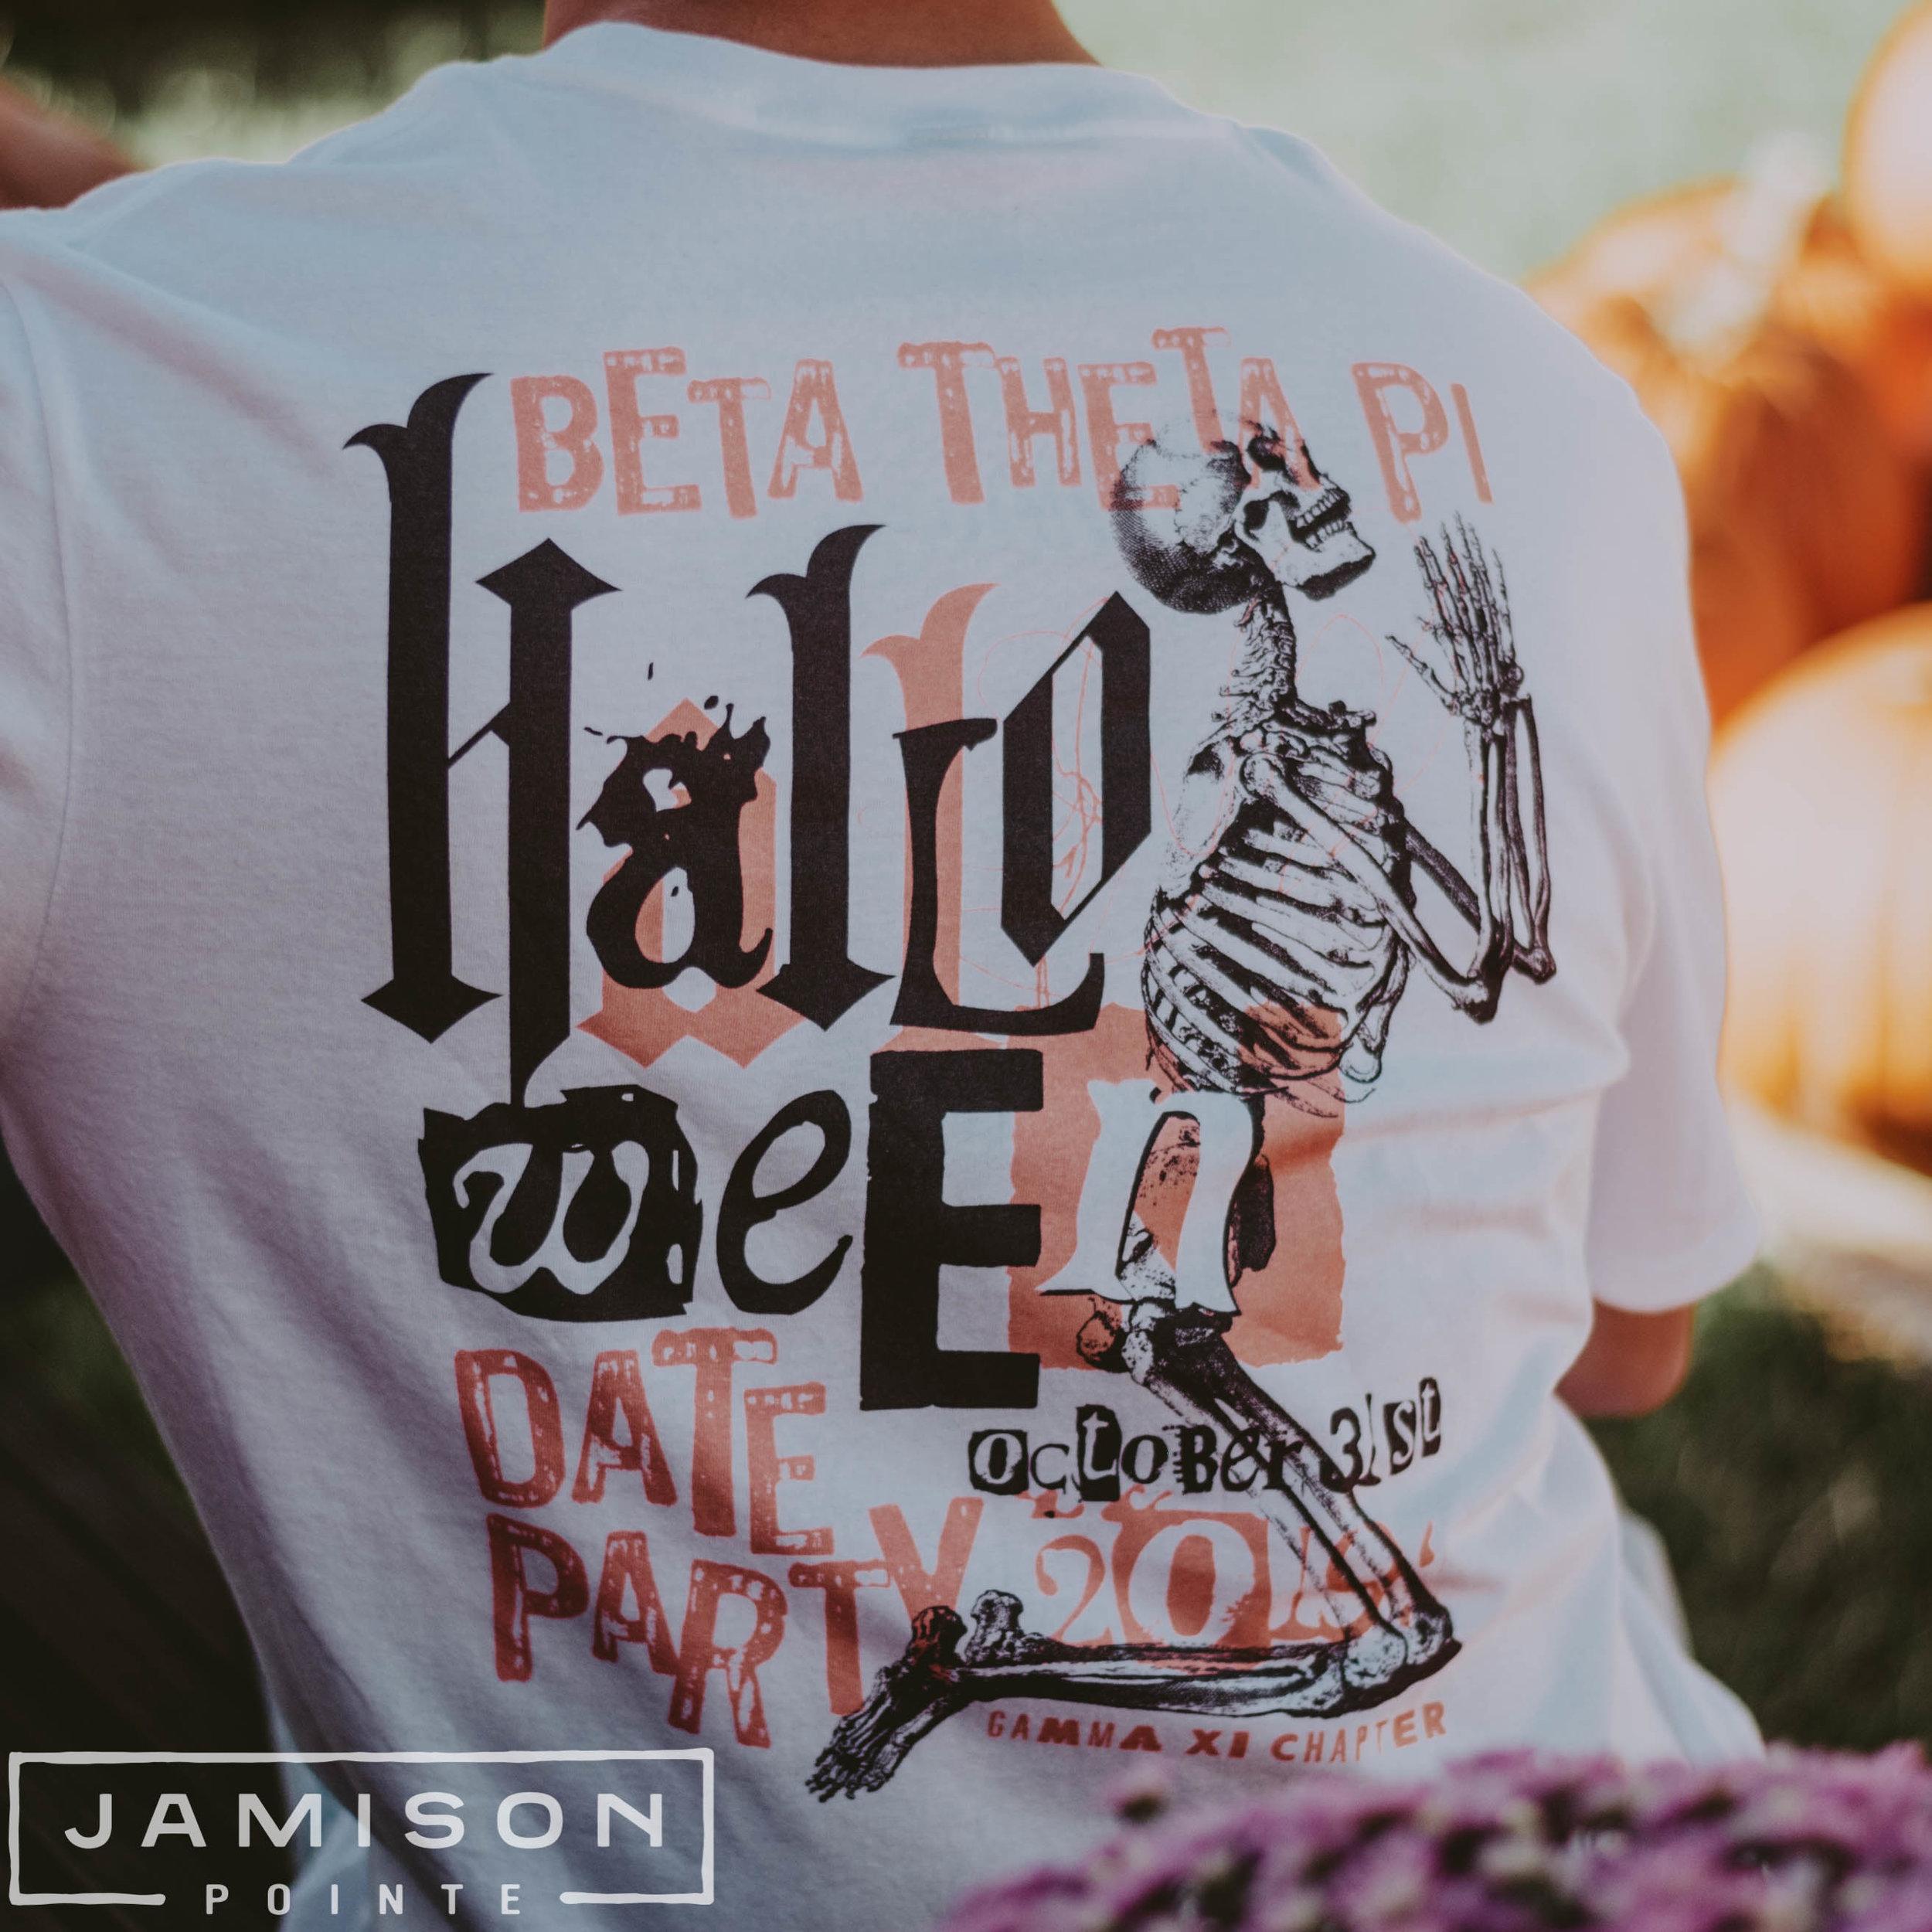 Beta Theta Pi Halloween Party Tshirt